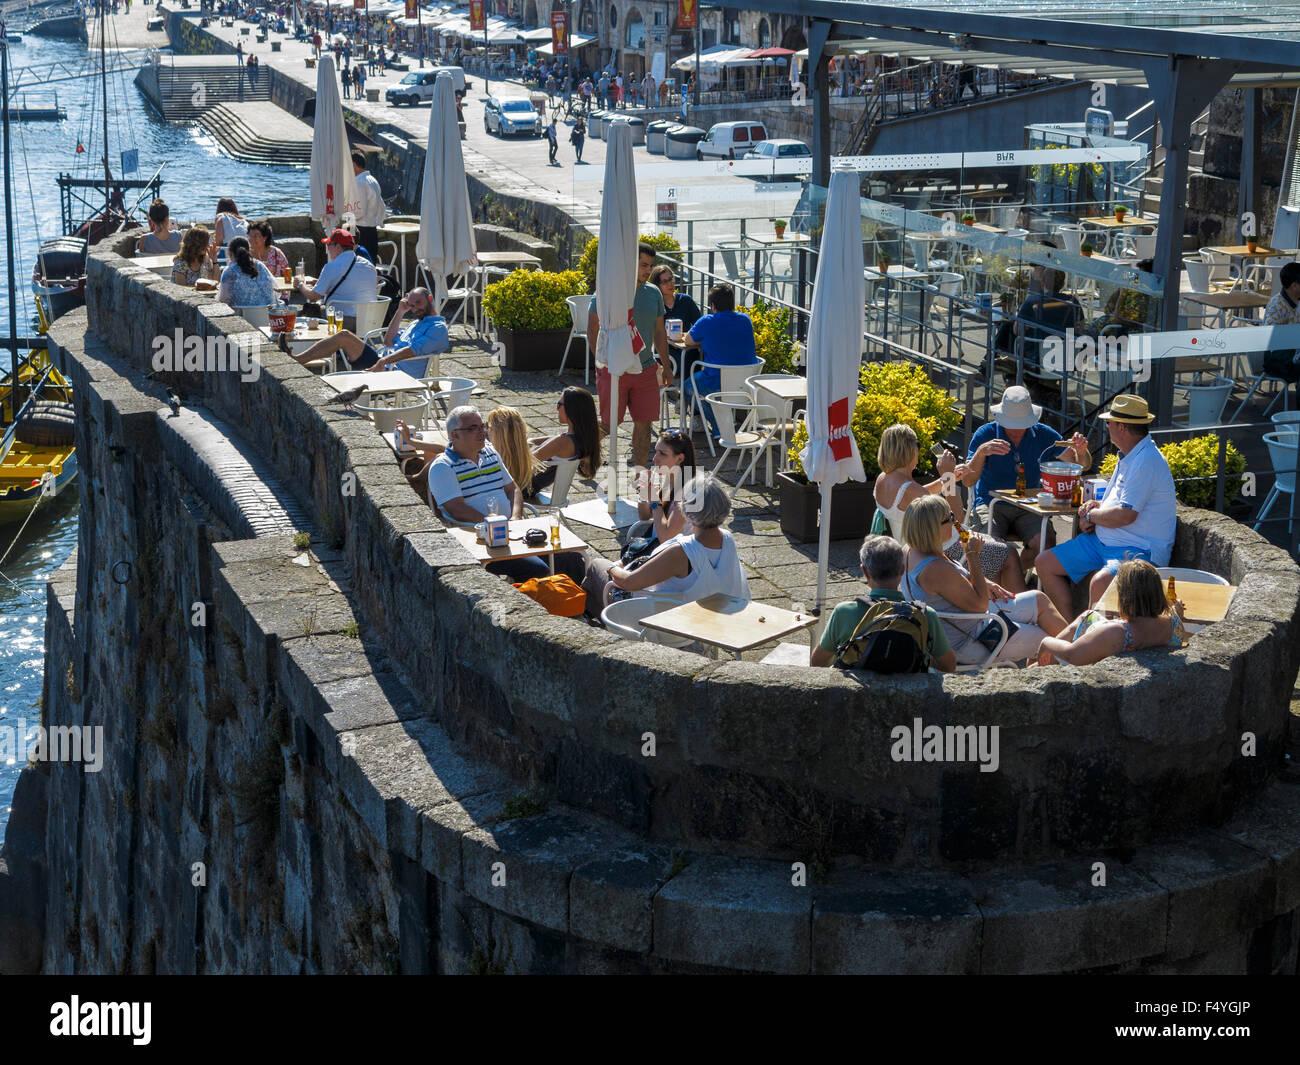 Visitors relaxing at Bar Ponte Pensil on the Cais da RIbeira Porto (Oporto) Portugal - Stock Image